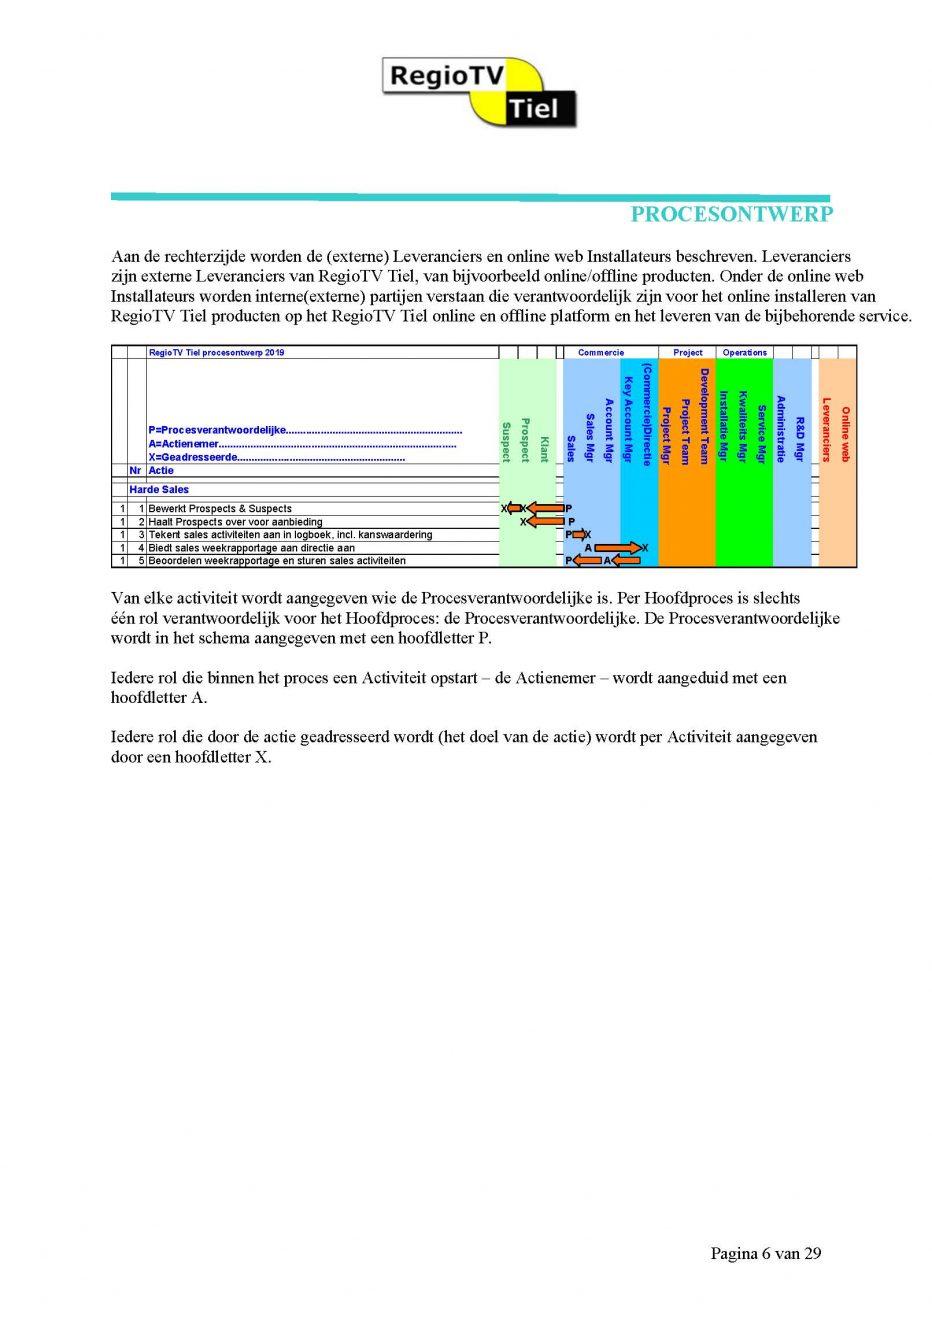 15.-RegioTV-Tiel-Procesontwerp-Handboek_Pagina_06-1.jpg